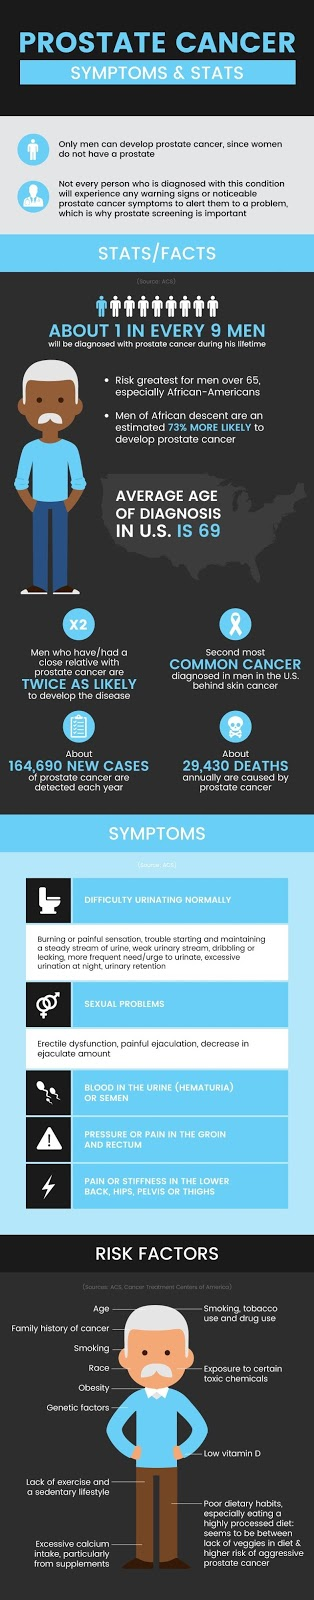 Prostate, Prostate Cancer, Prostate Cancer Stages, Prostate Cancer Symptoms, Prostate Gland, Prostatitis, Prostatitis Symptoms, Signs Of Prostate Cancer